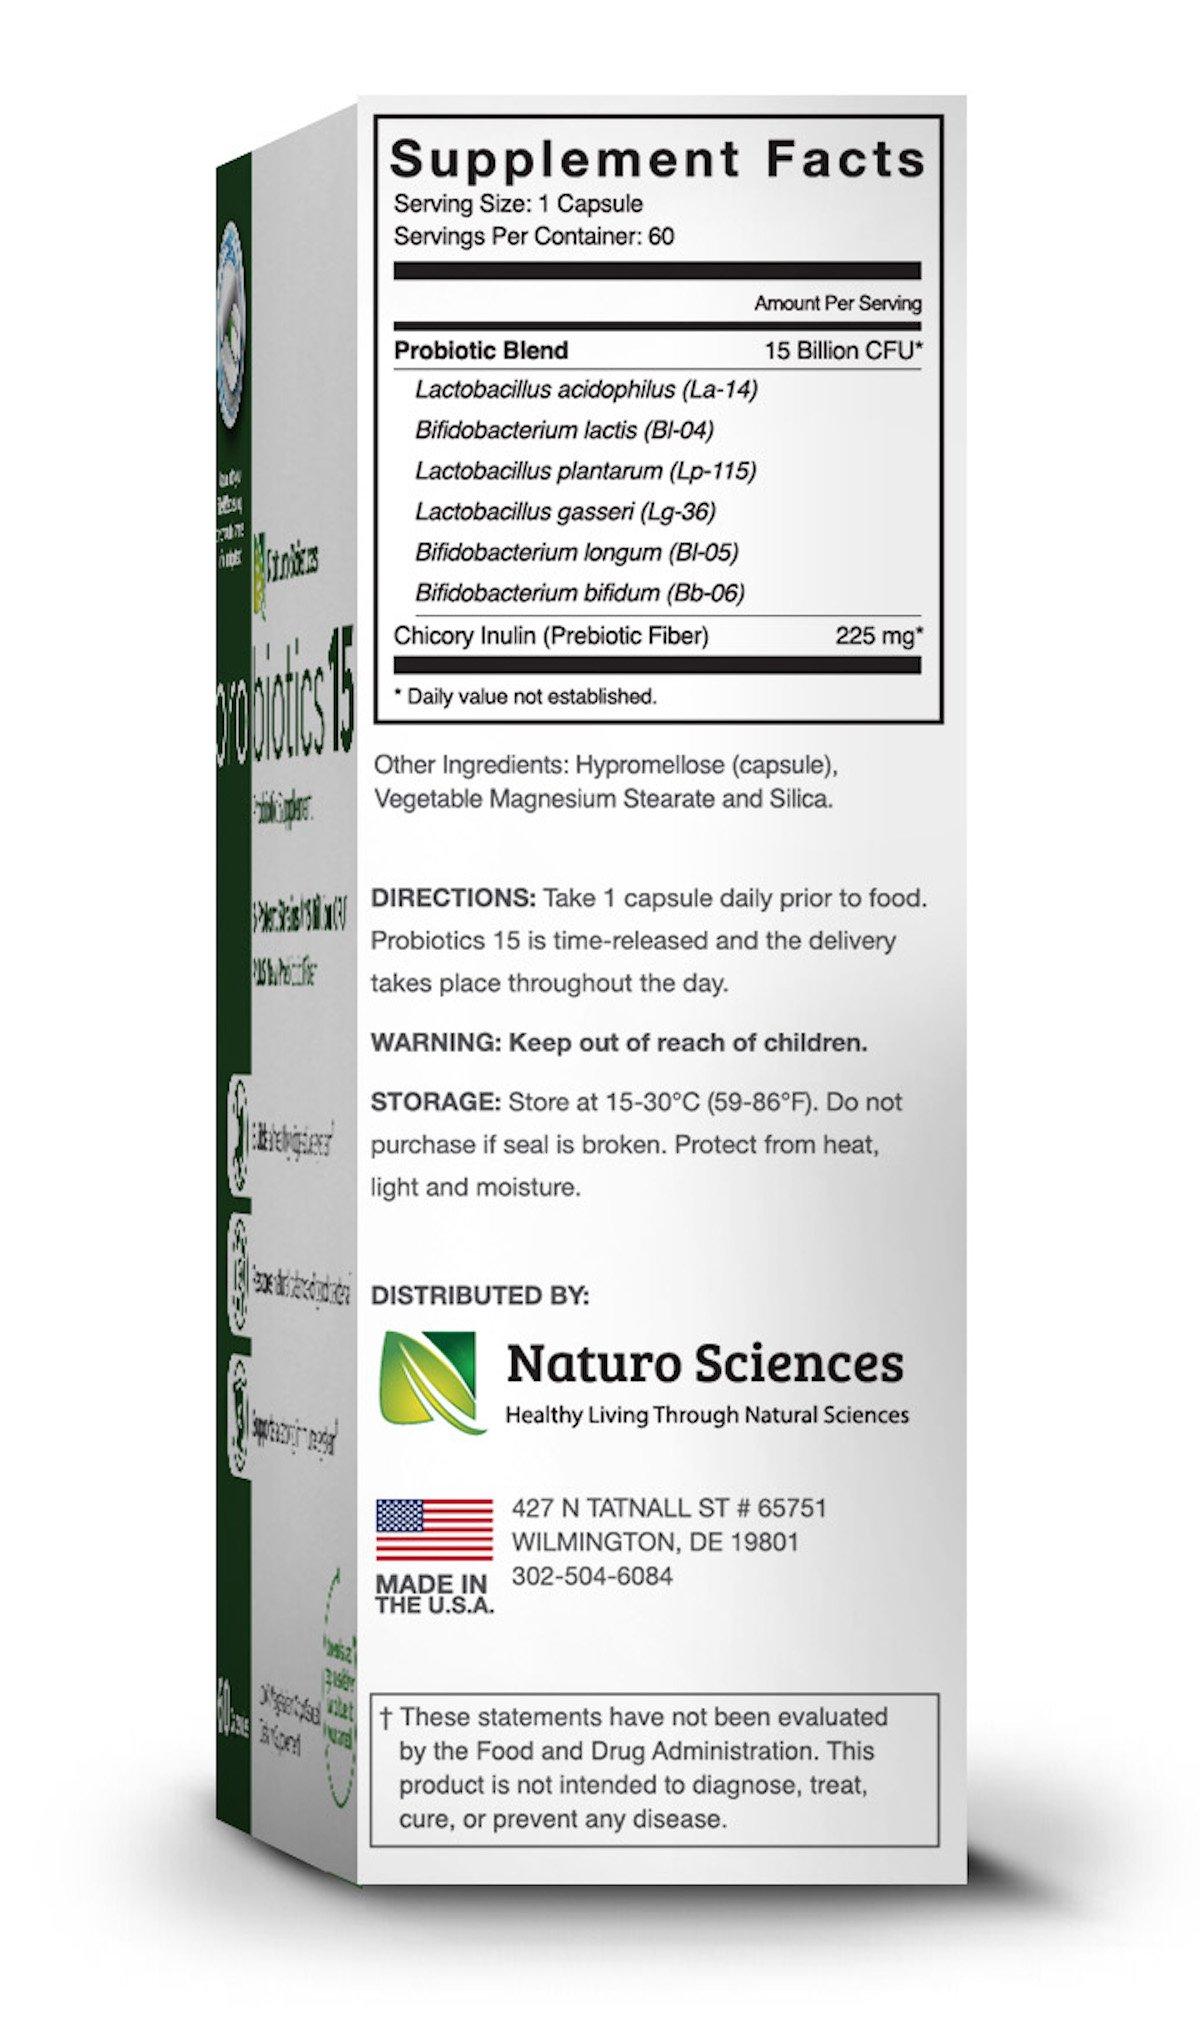 Naturo Sciences Probiotics 15 Billion CFU, Advanced Probiotic Supplement, Time Released Capsules in Dry Nitrogen Filled Blister Packs, 60 Servings, 1 a Day Servings by Naturo Sciences (Image #7)